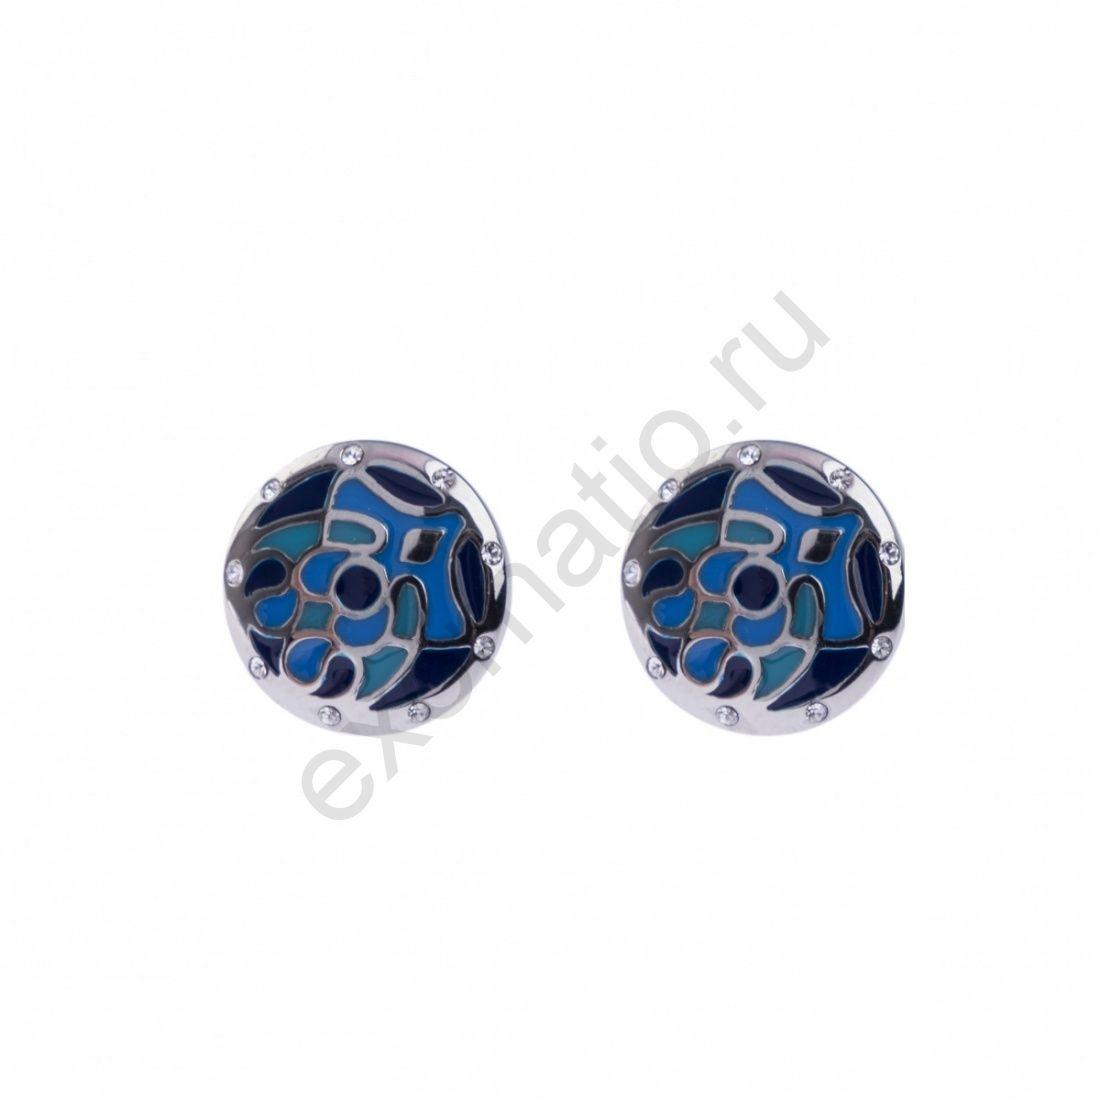 Серьги Fiore Luna AE01219-1 BL